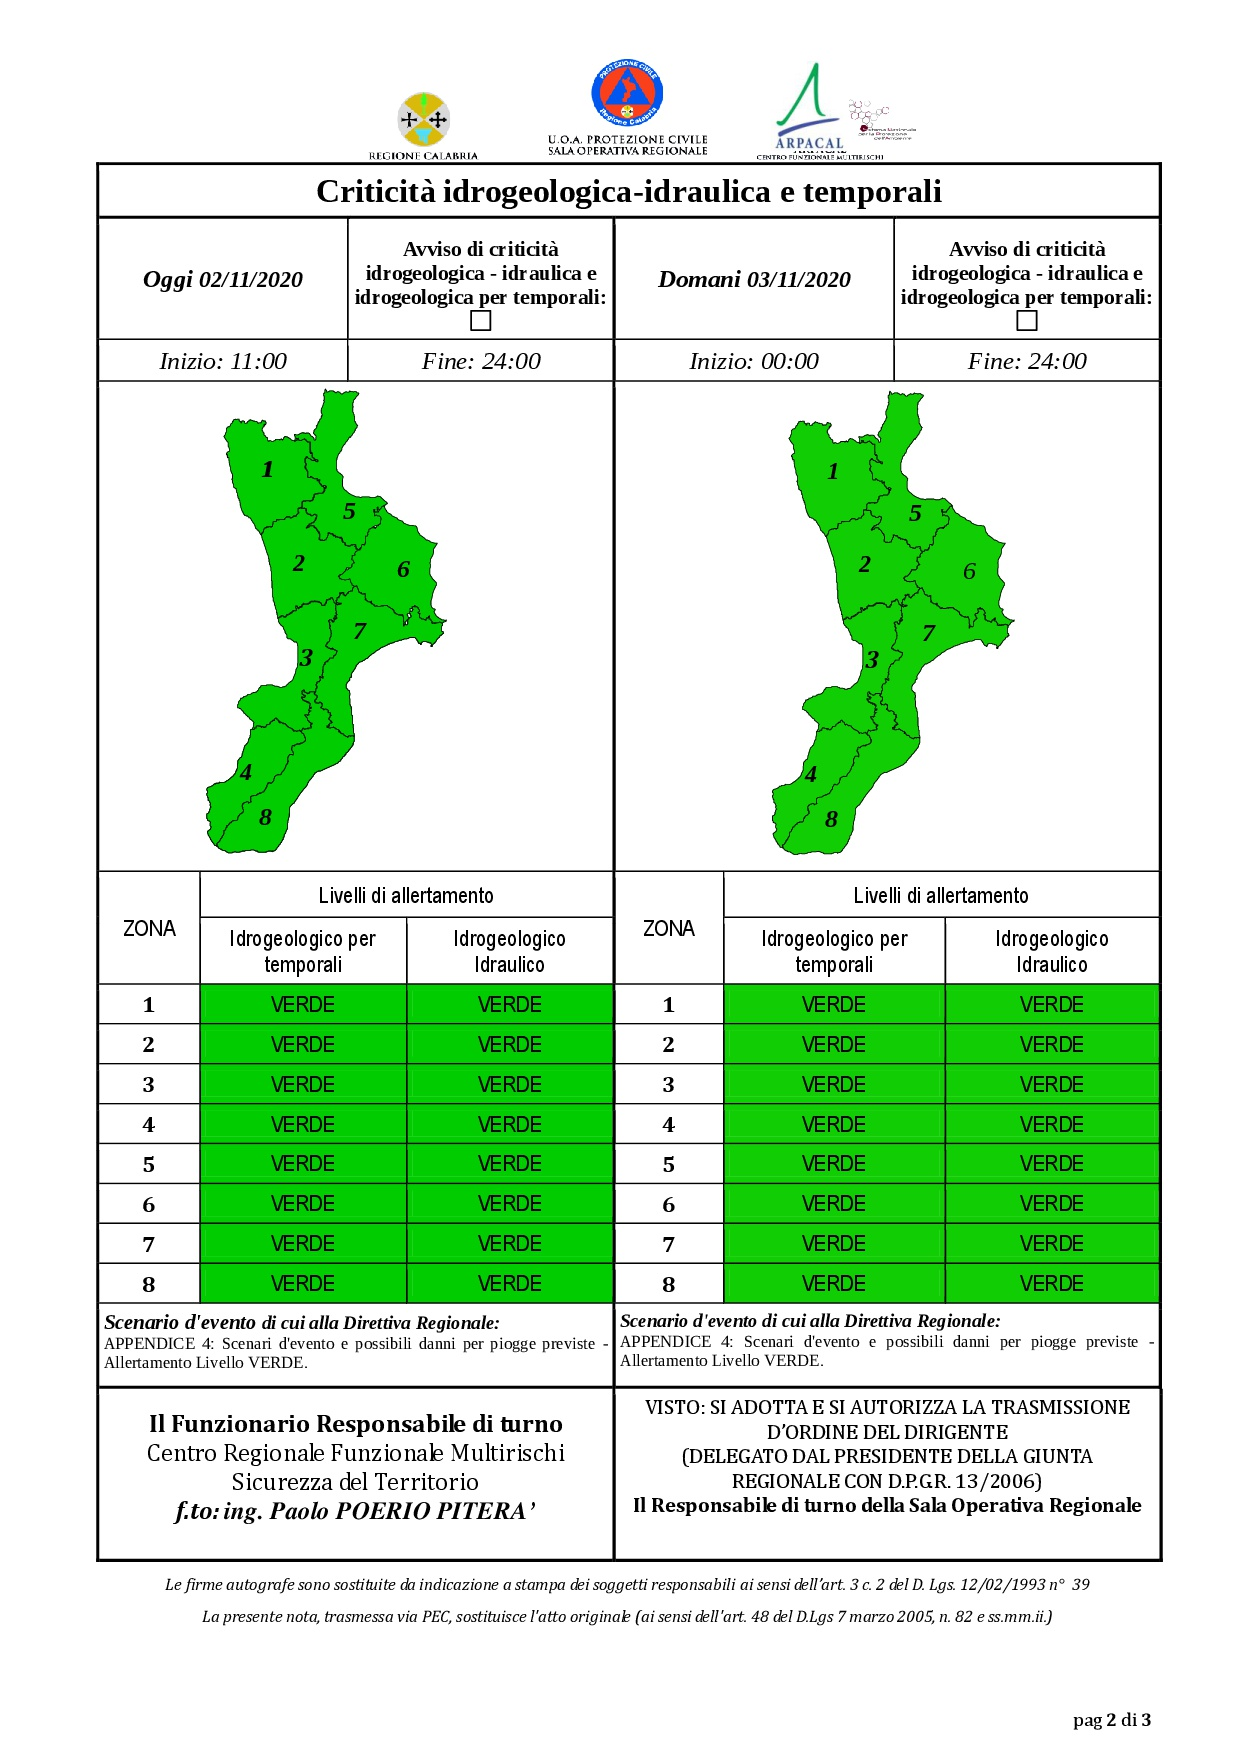 Criticità idrogeologica-idraulica e temporali in Calabria 02-11-2020